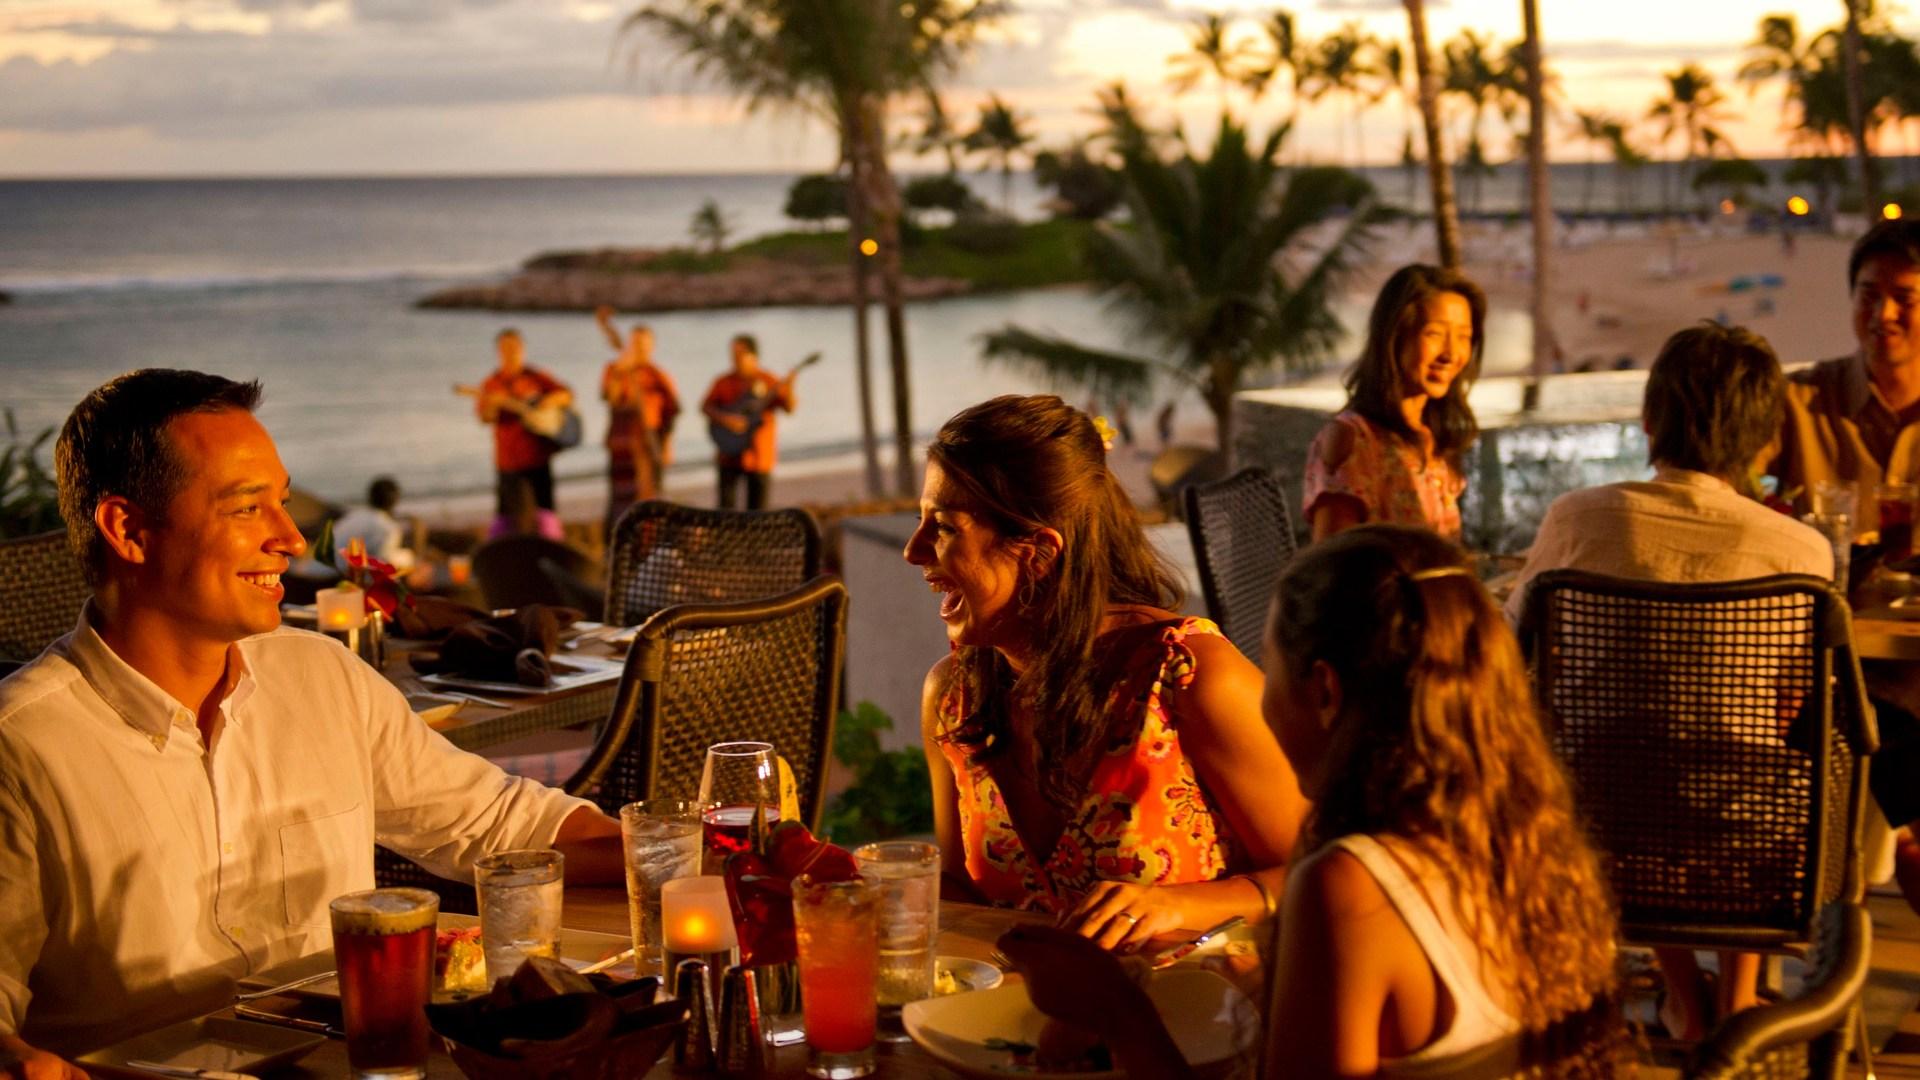 ama-ama-restaurant-beachside-dining-16x9